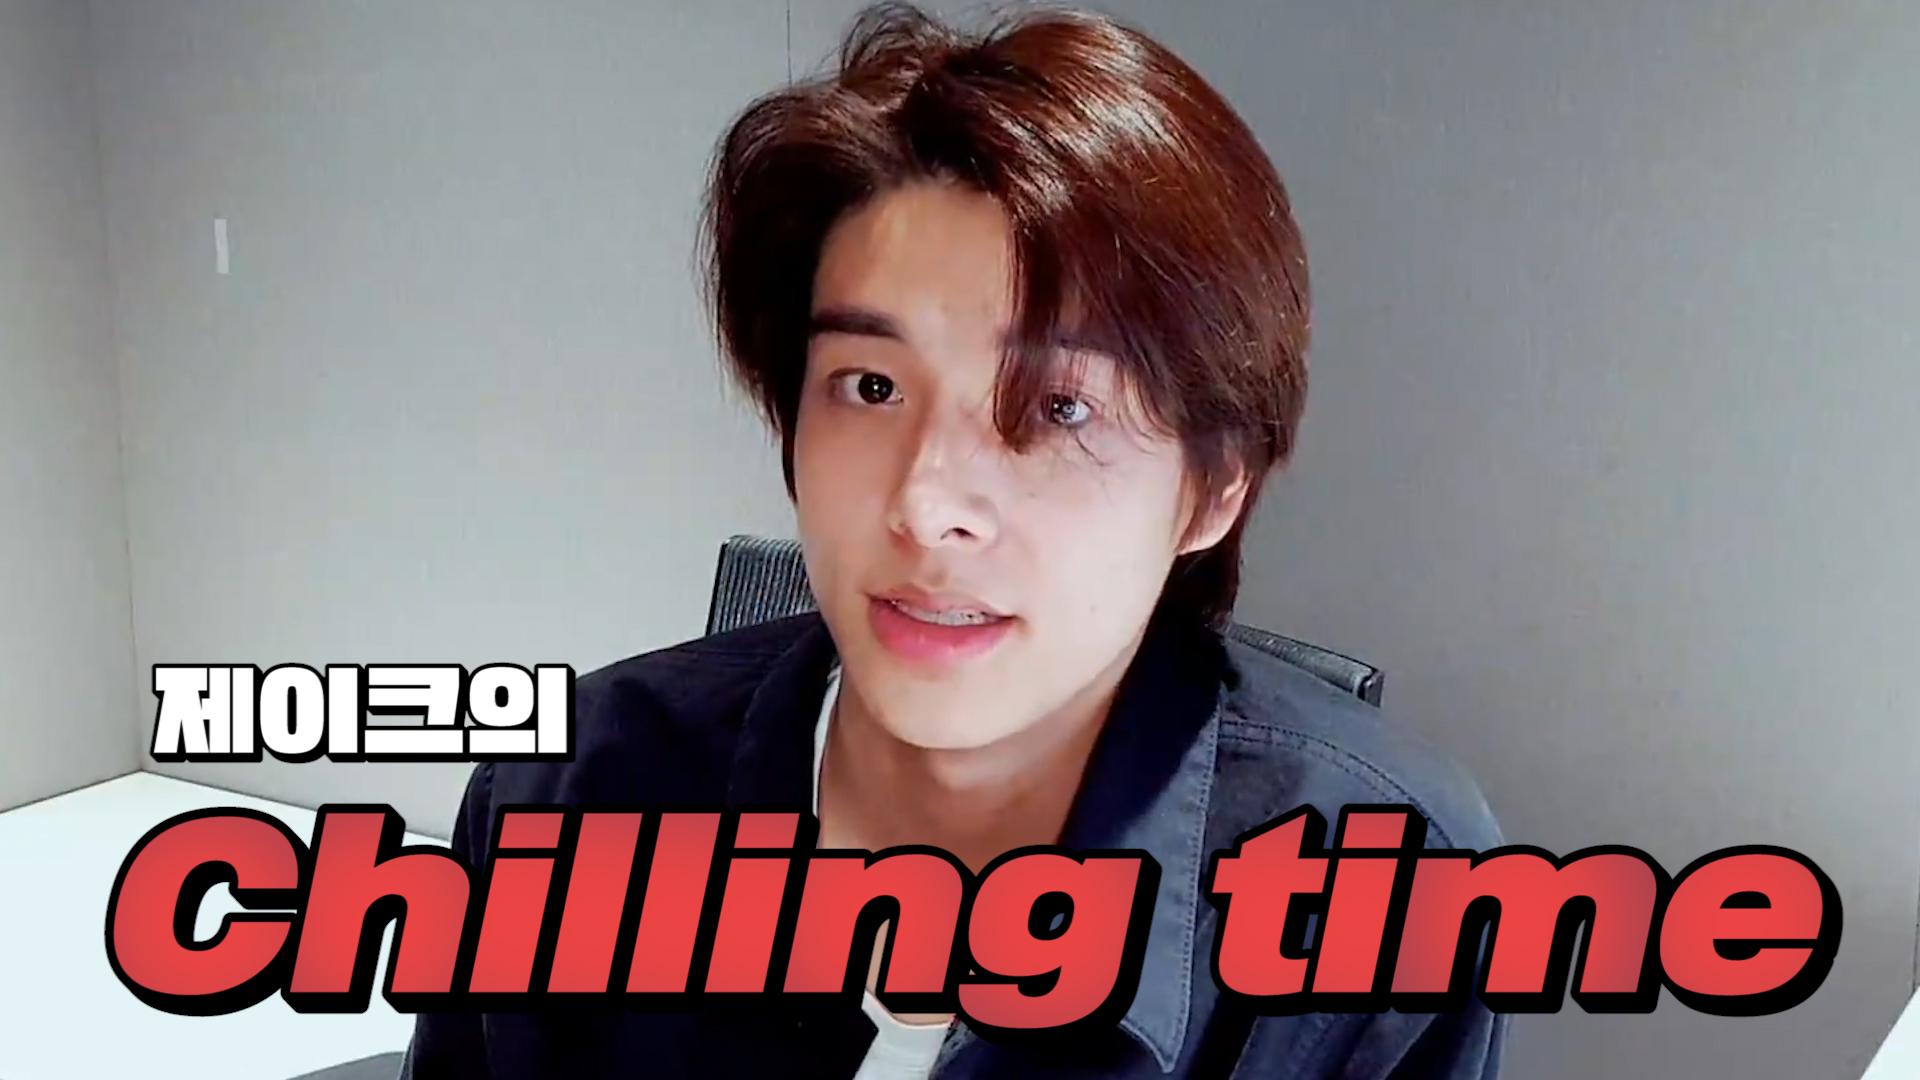 [ENHYPEN] 심재윤이 있어 내 하루가 밝아졌다는 말 밖엔..🌻(JAKE's 1st Chilling Time!)